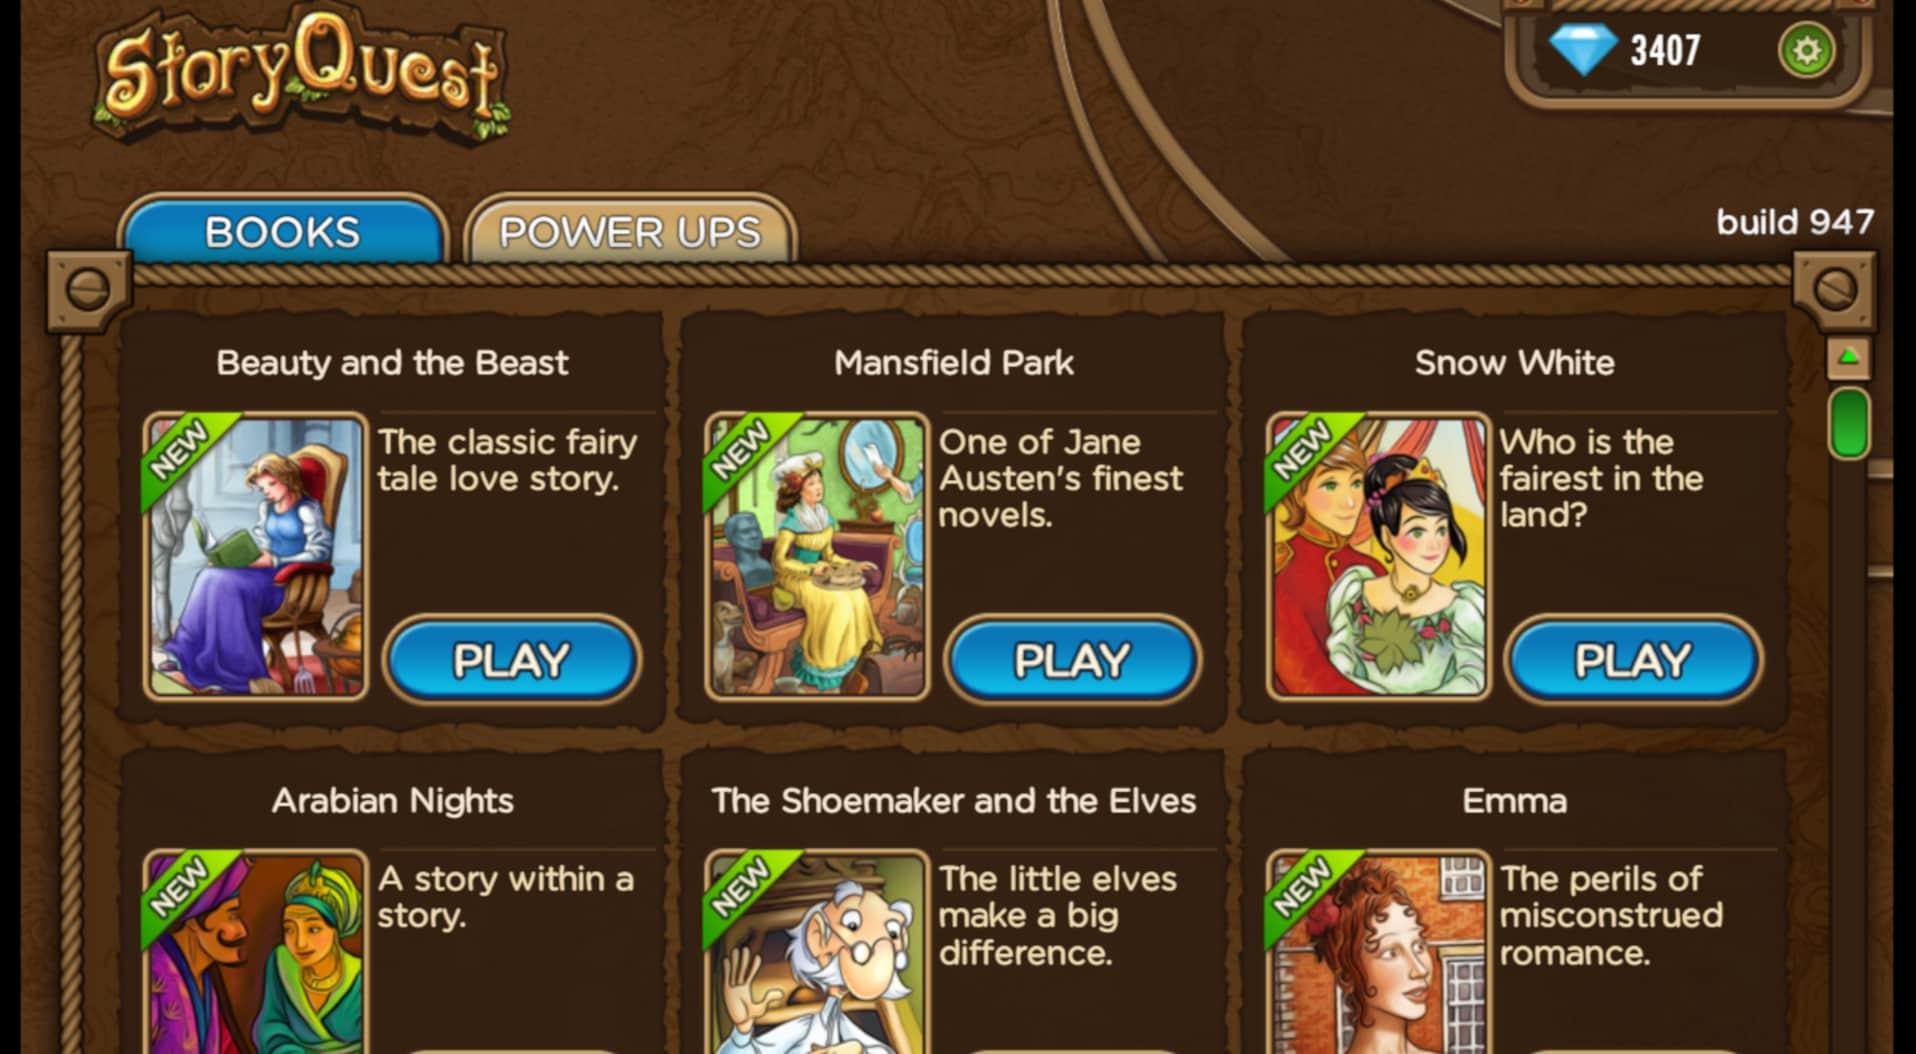 Ghostbusters slot machine